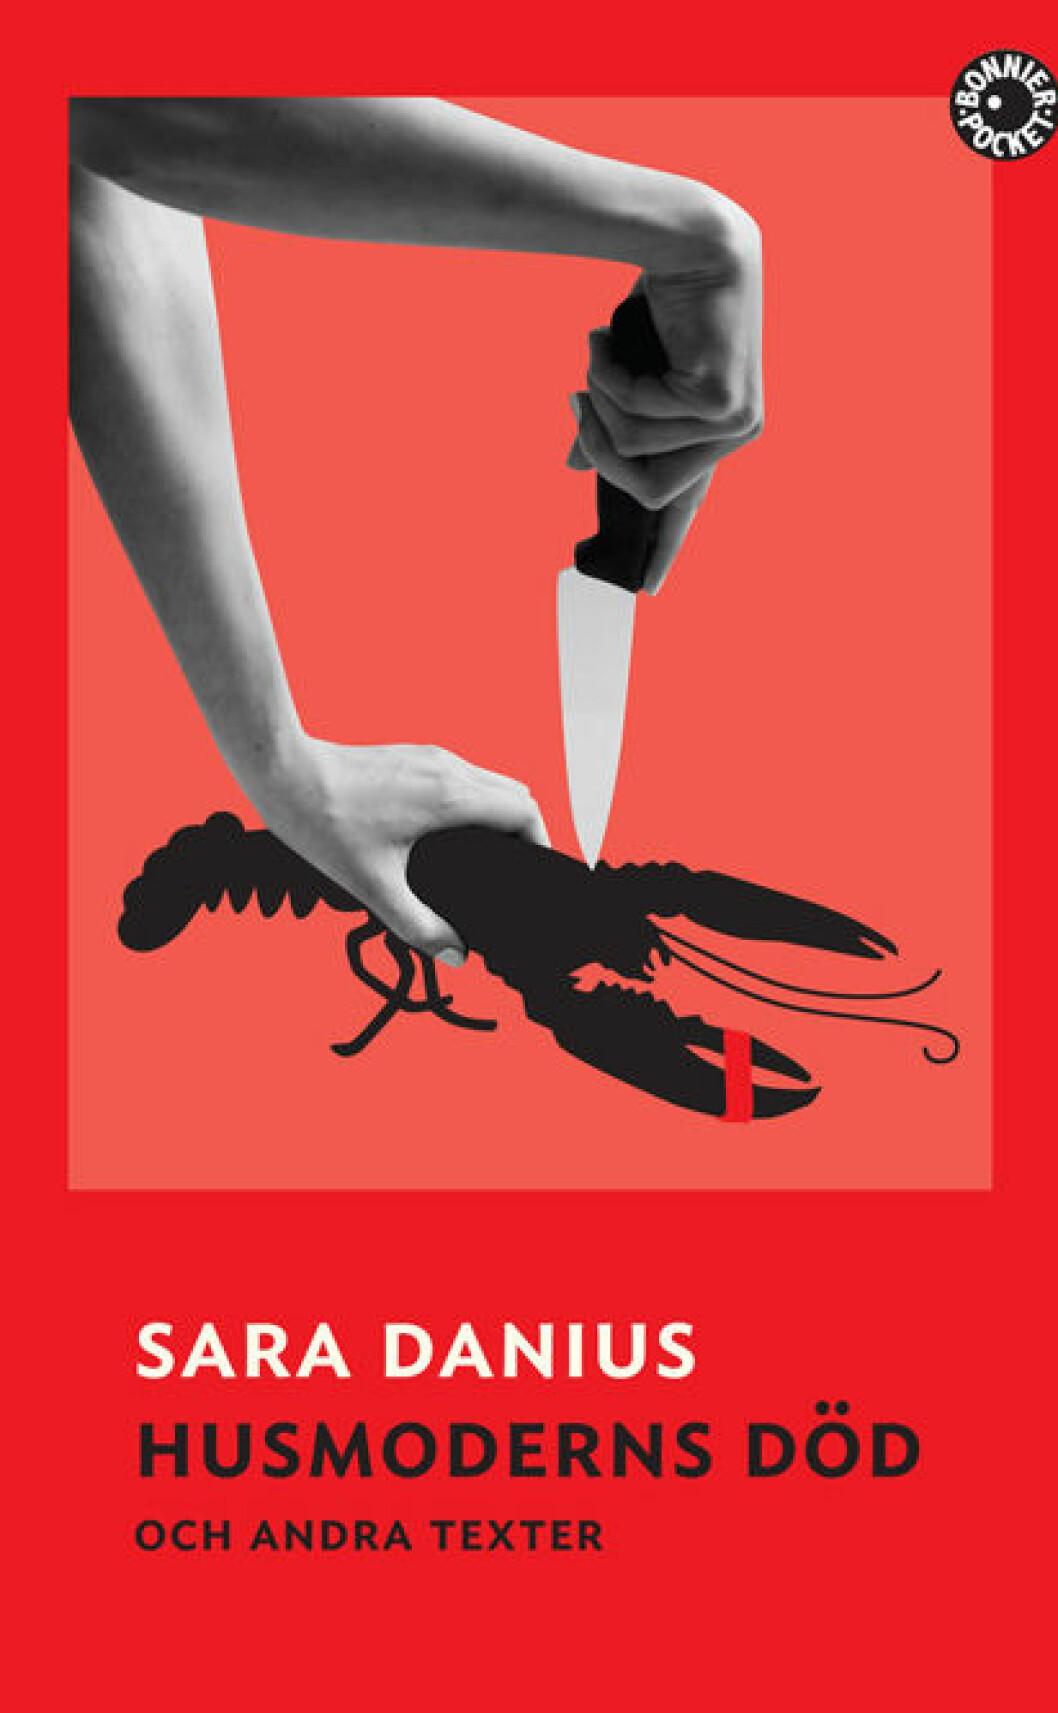 Husmoderns död av Sara Danius